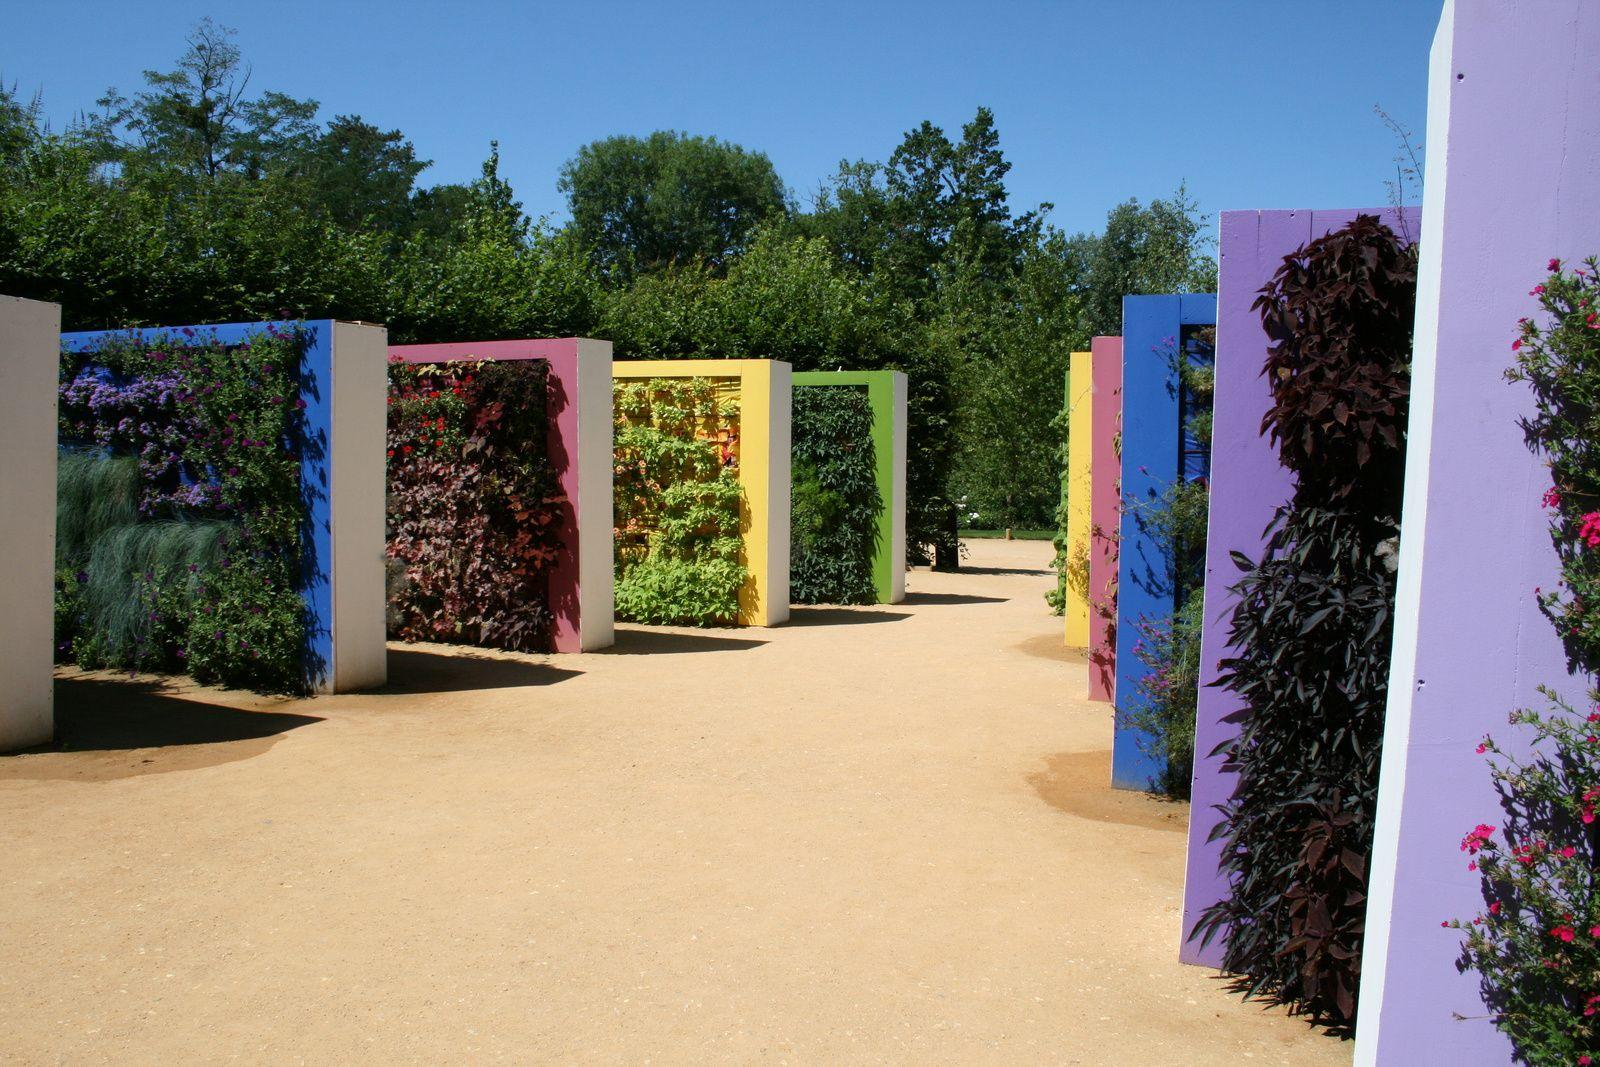 #multicolore #jardins #exposition #chaumontsurloire #charlotteblabla blog